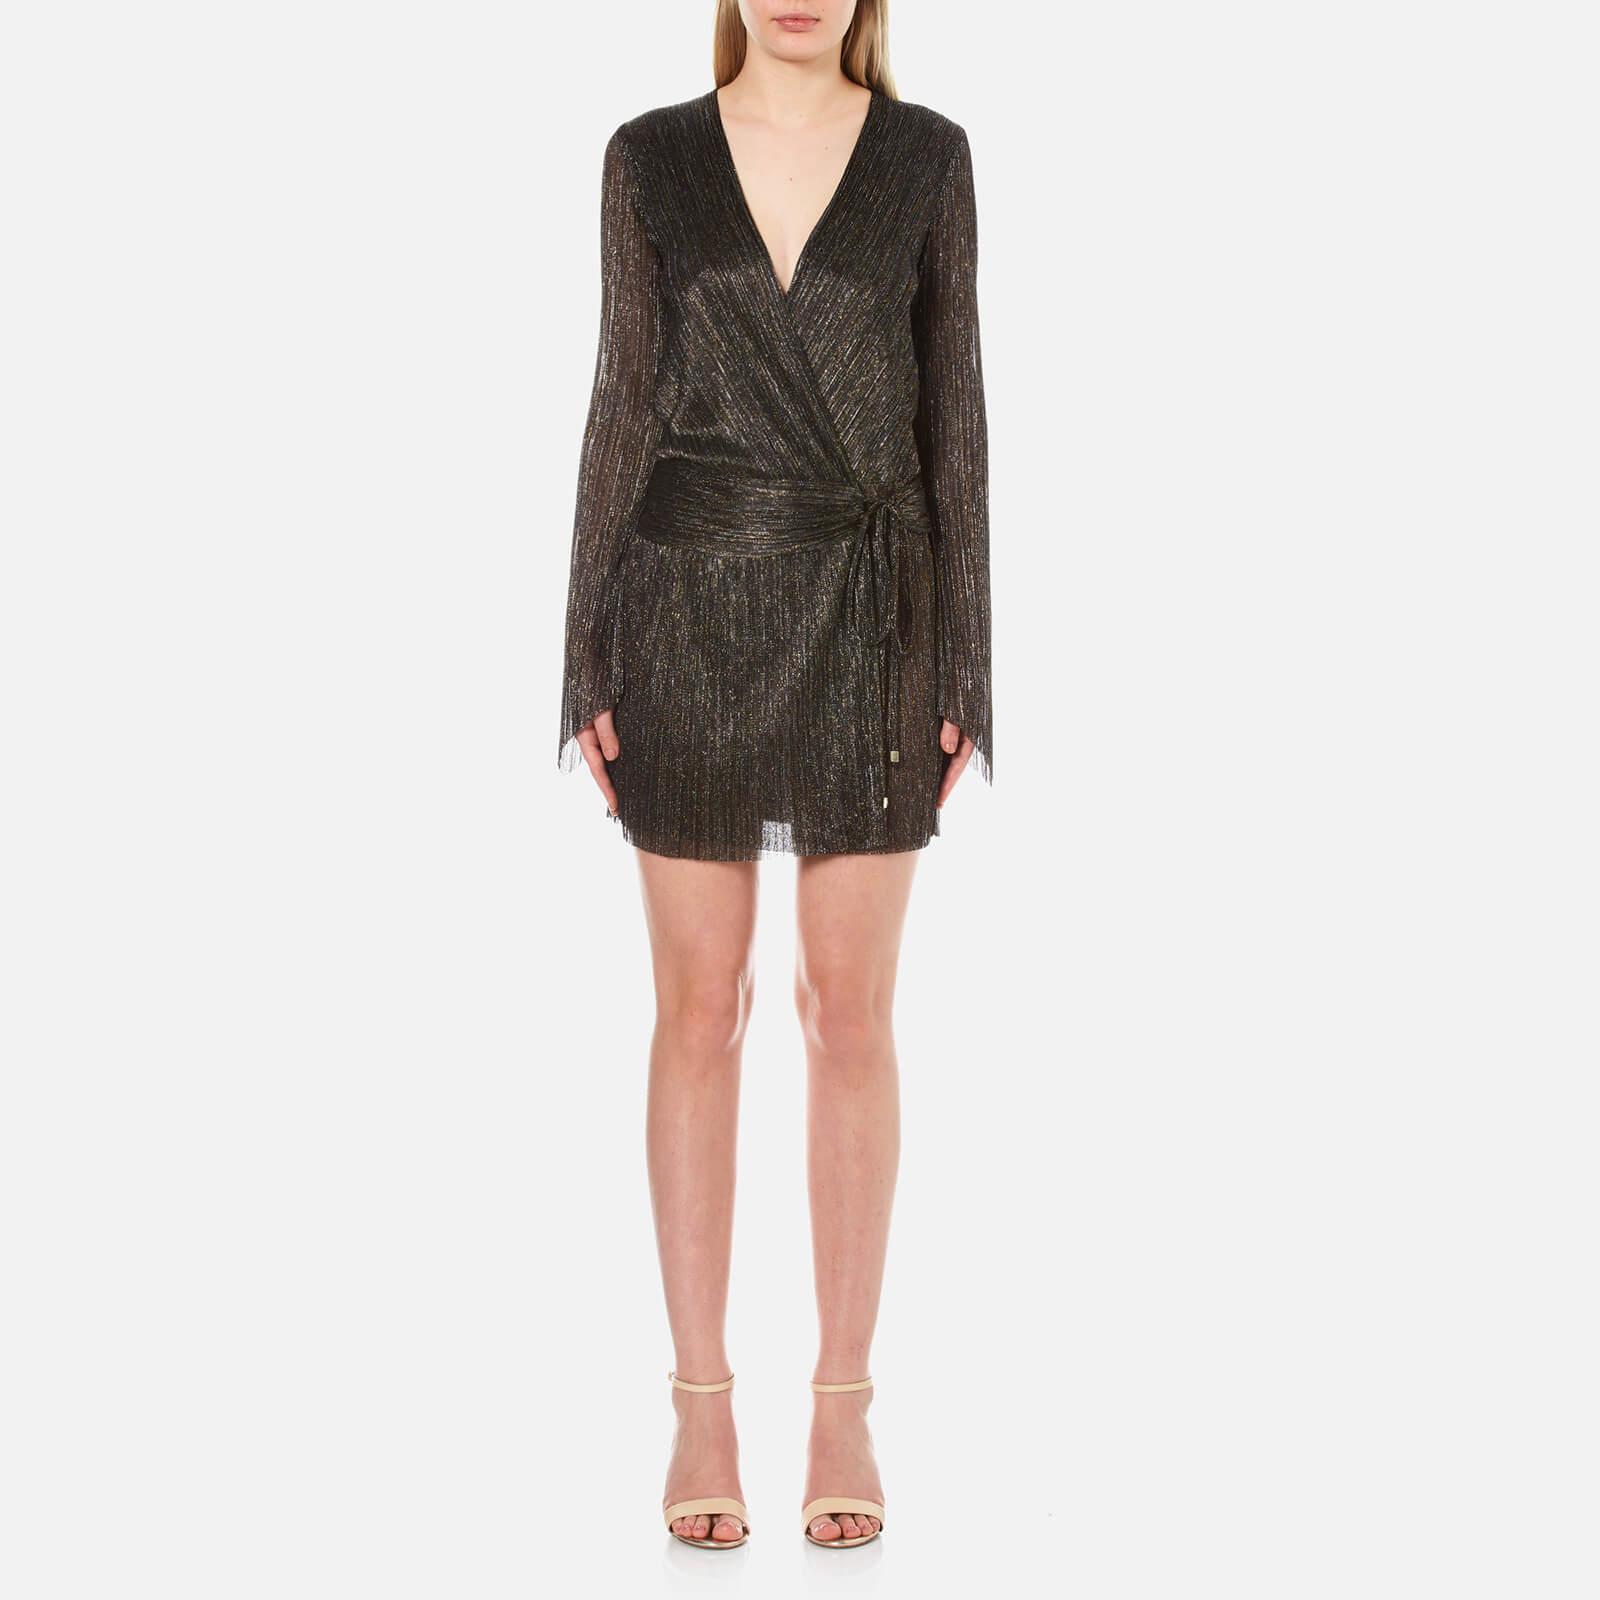 e4a548ab Bec & Bridge Women's Glitter Rain Long Sleeve Dress - Gold/Silver Black -  Free UK Delivery over £50